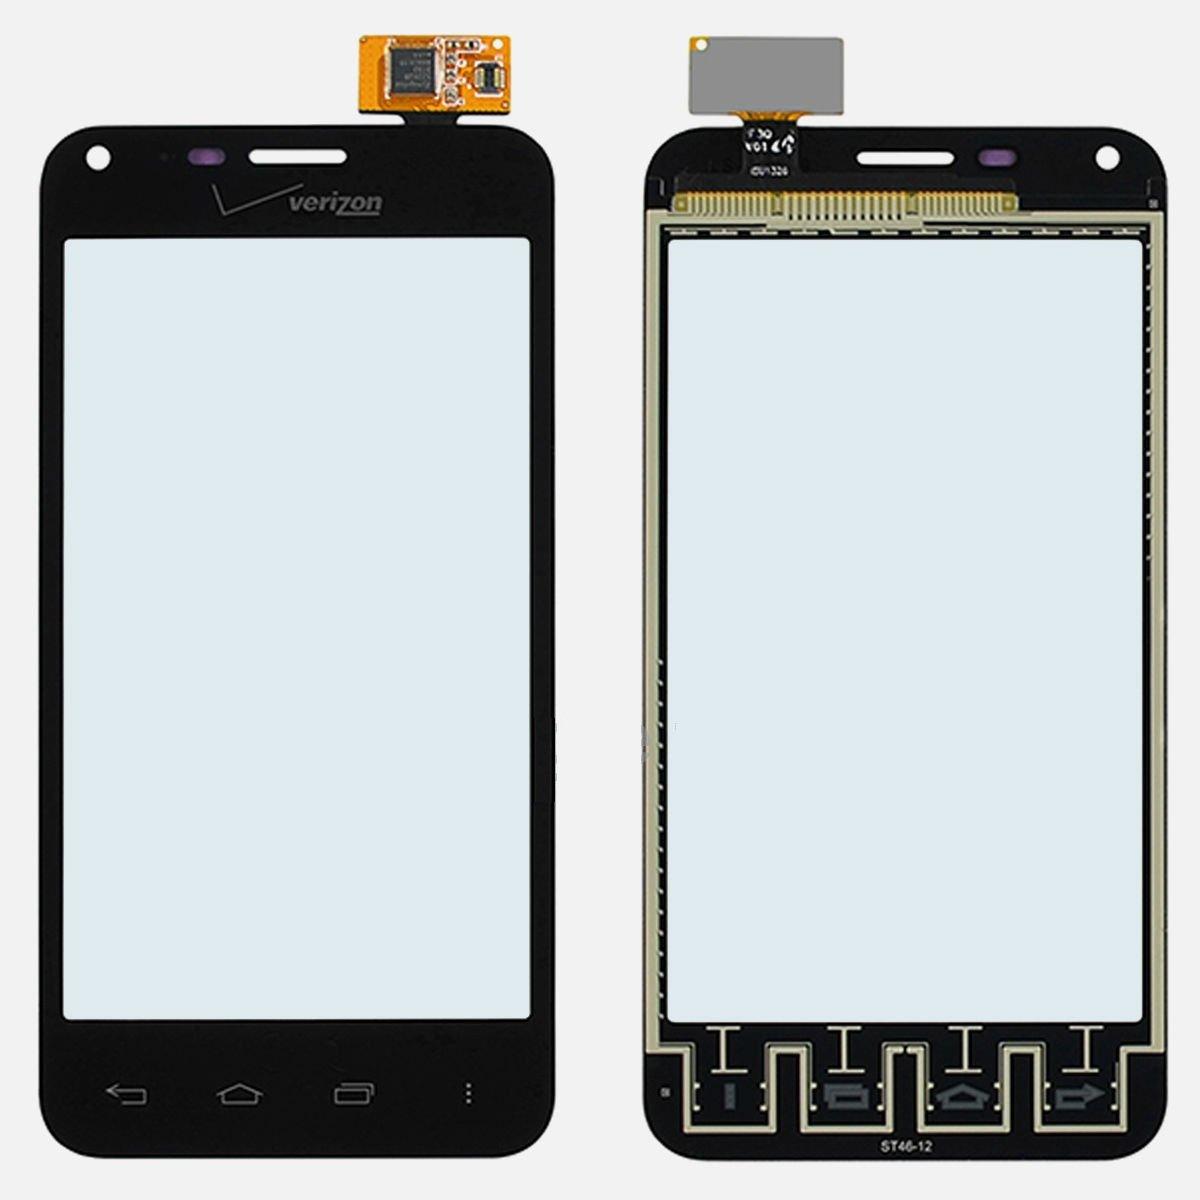 New OEM Verizon LG Enact VS890 Digitizer Touch Screen Panel Glass Lens Part